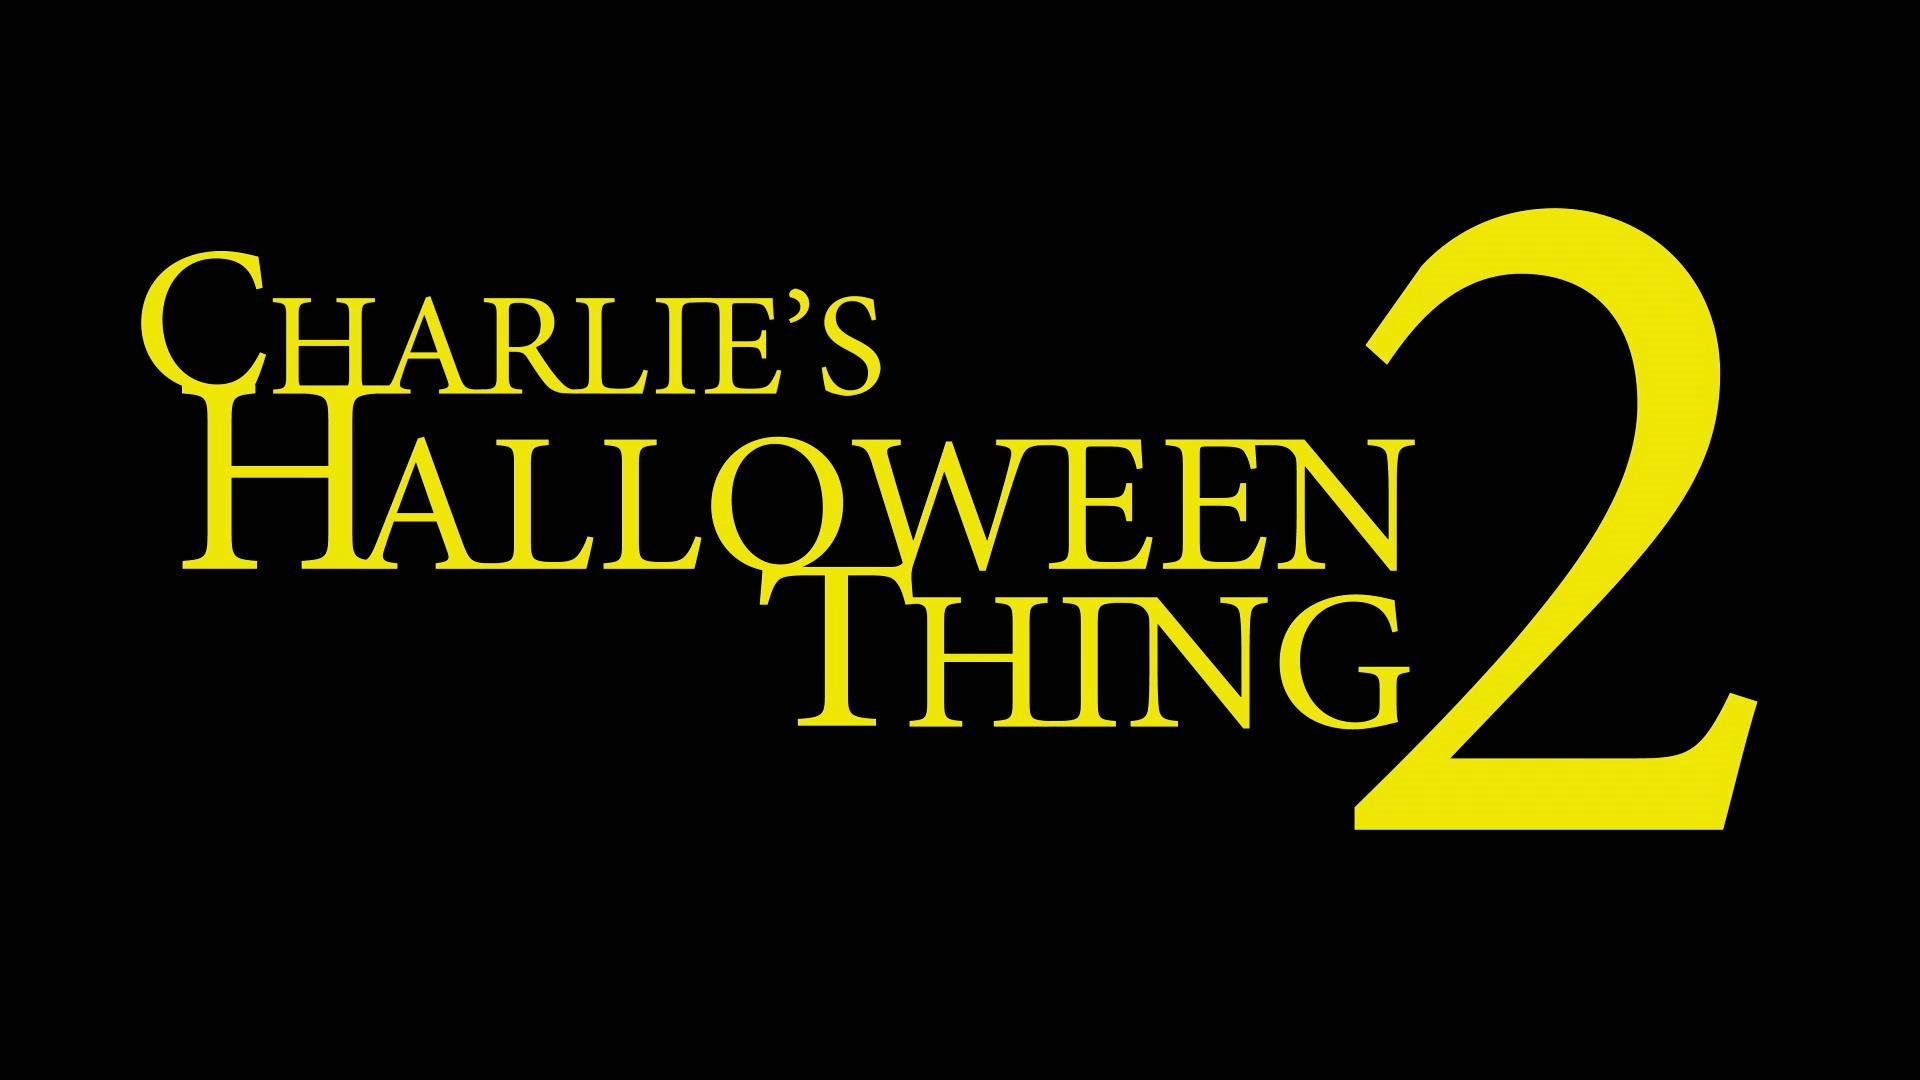 Мы обычные медведи — s04e26 — Charlie's Halloween Thing 2